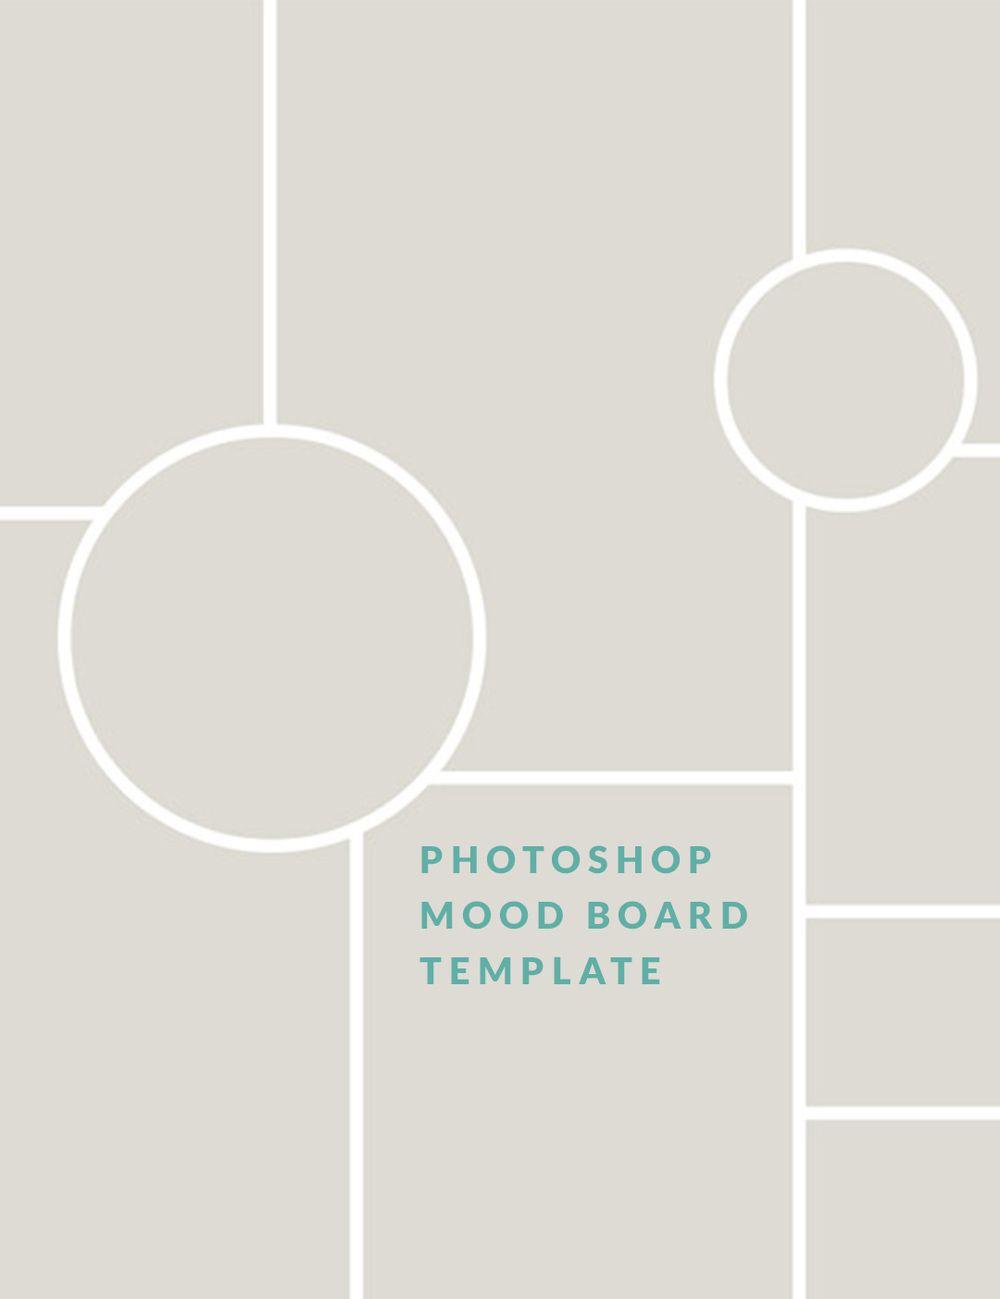 fashion mood board template - 1457970983684 1000 1299 moodboard pinterest brand